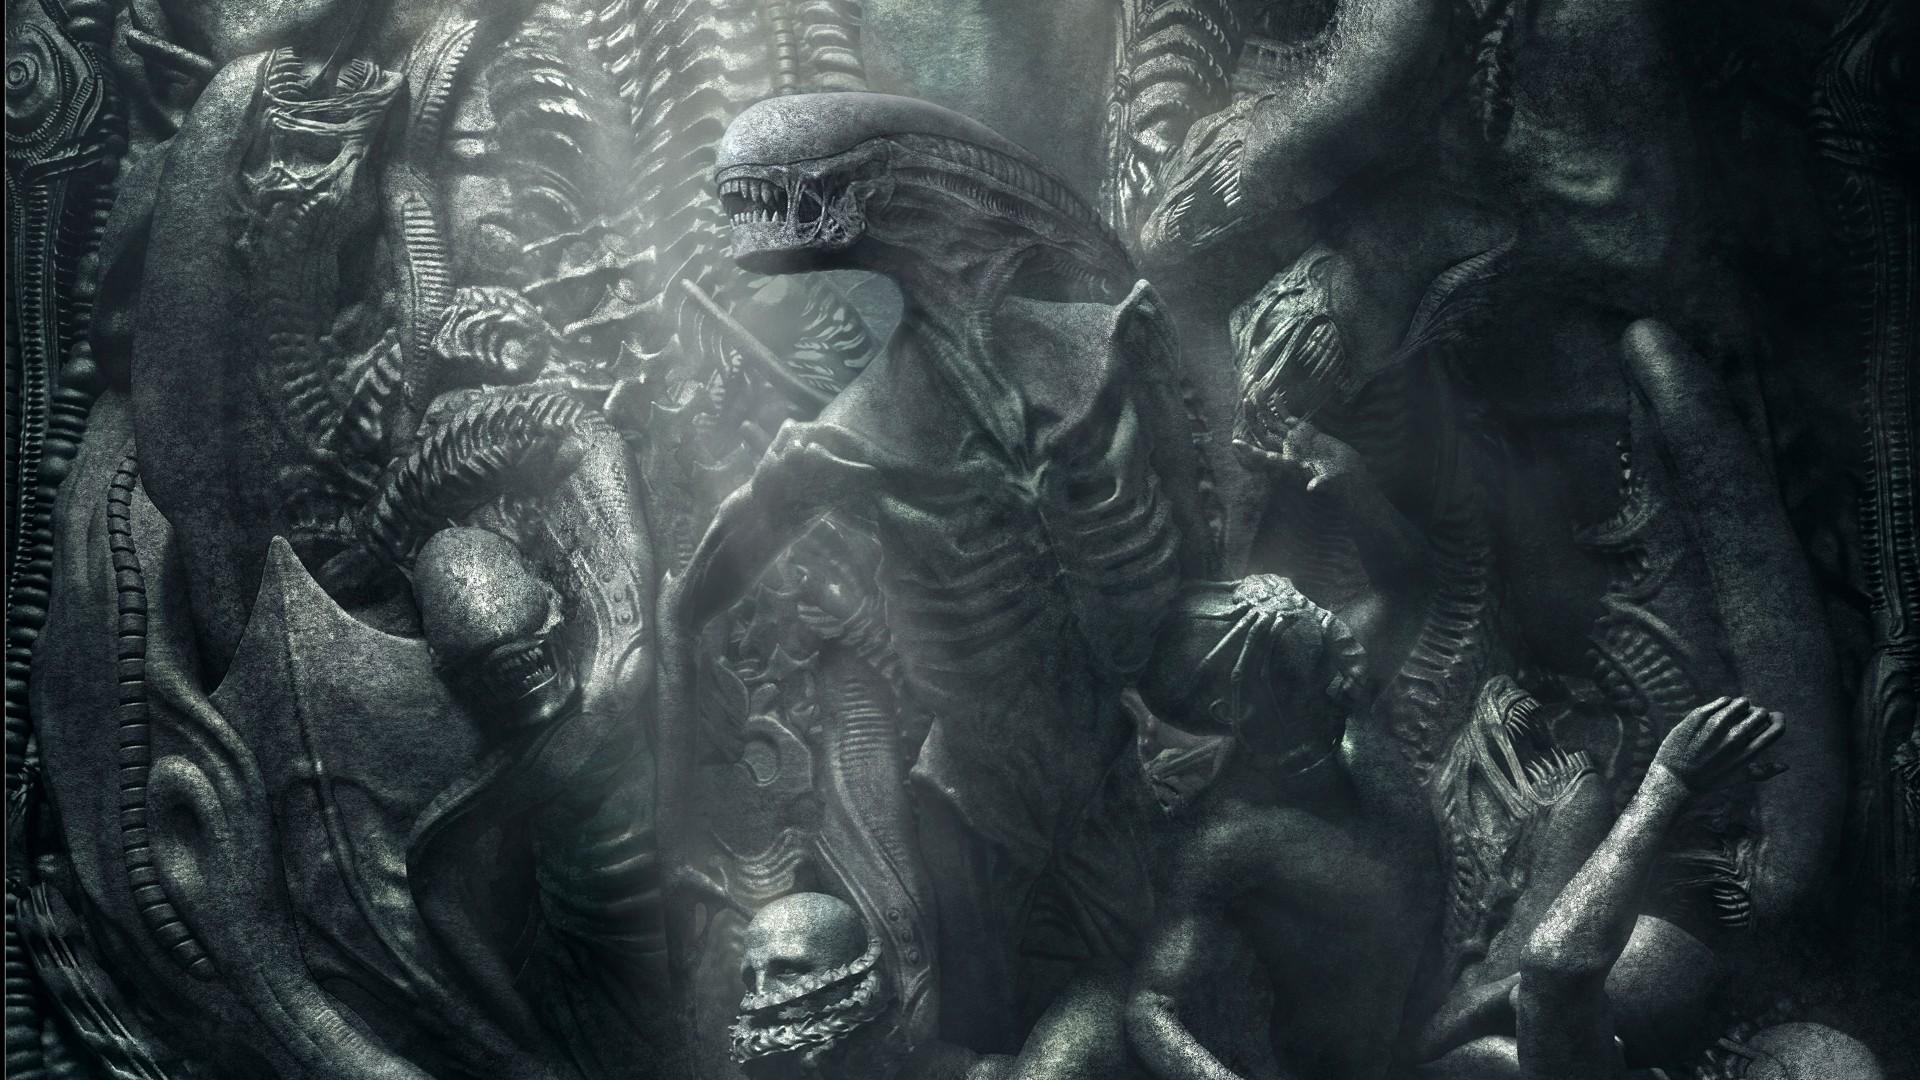 Cute Anime Alien Wallpapers Alien Covenant 2017 Movie Wallpapers Hd Wallpapers Id